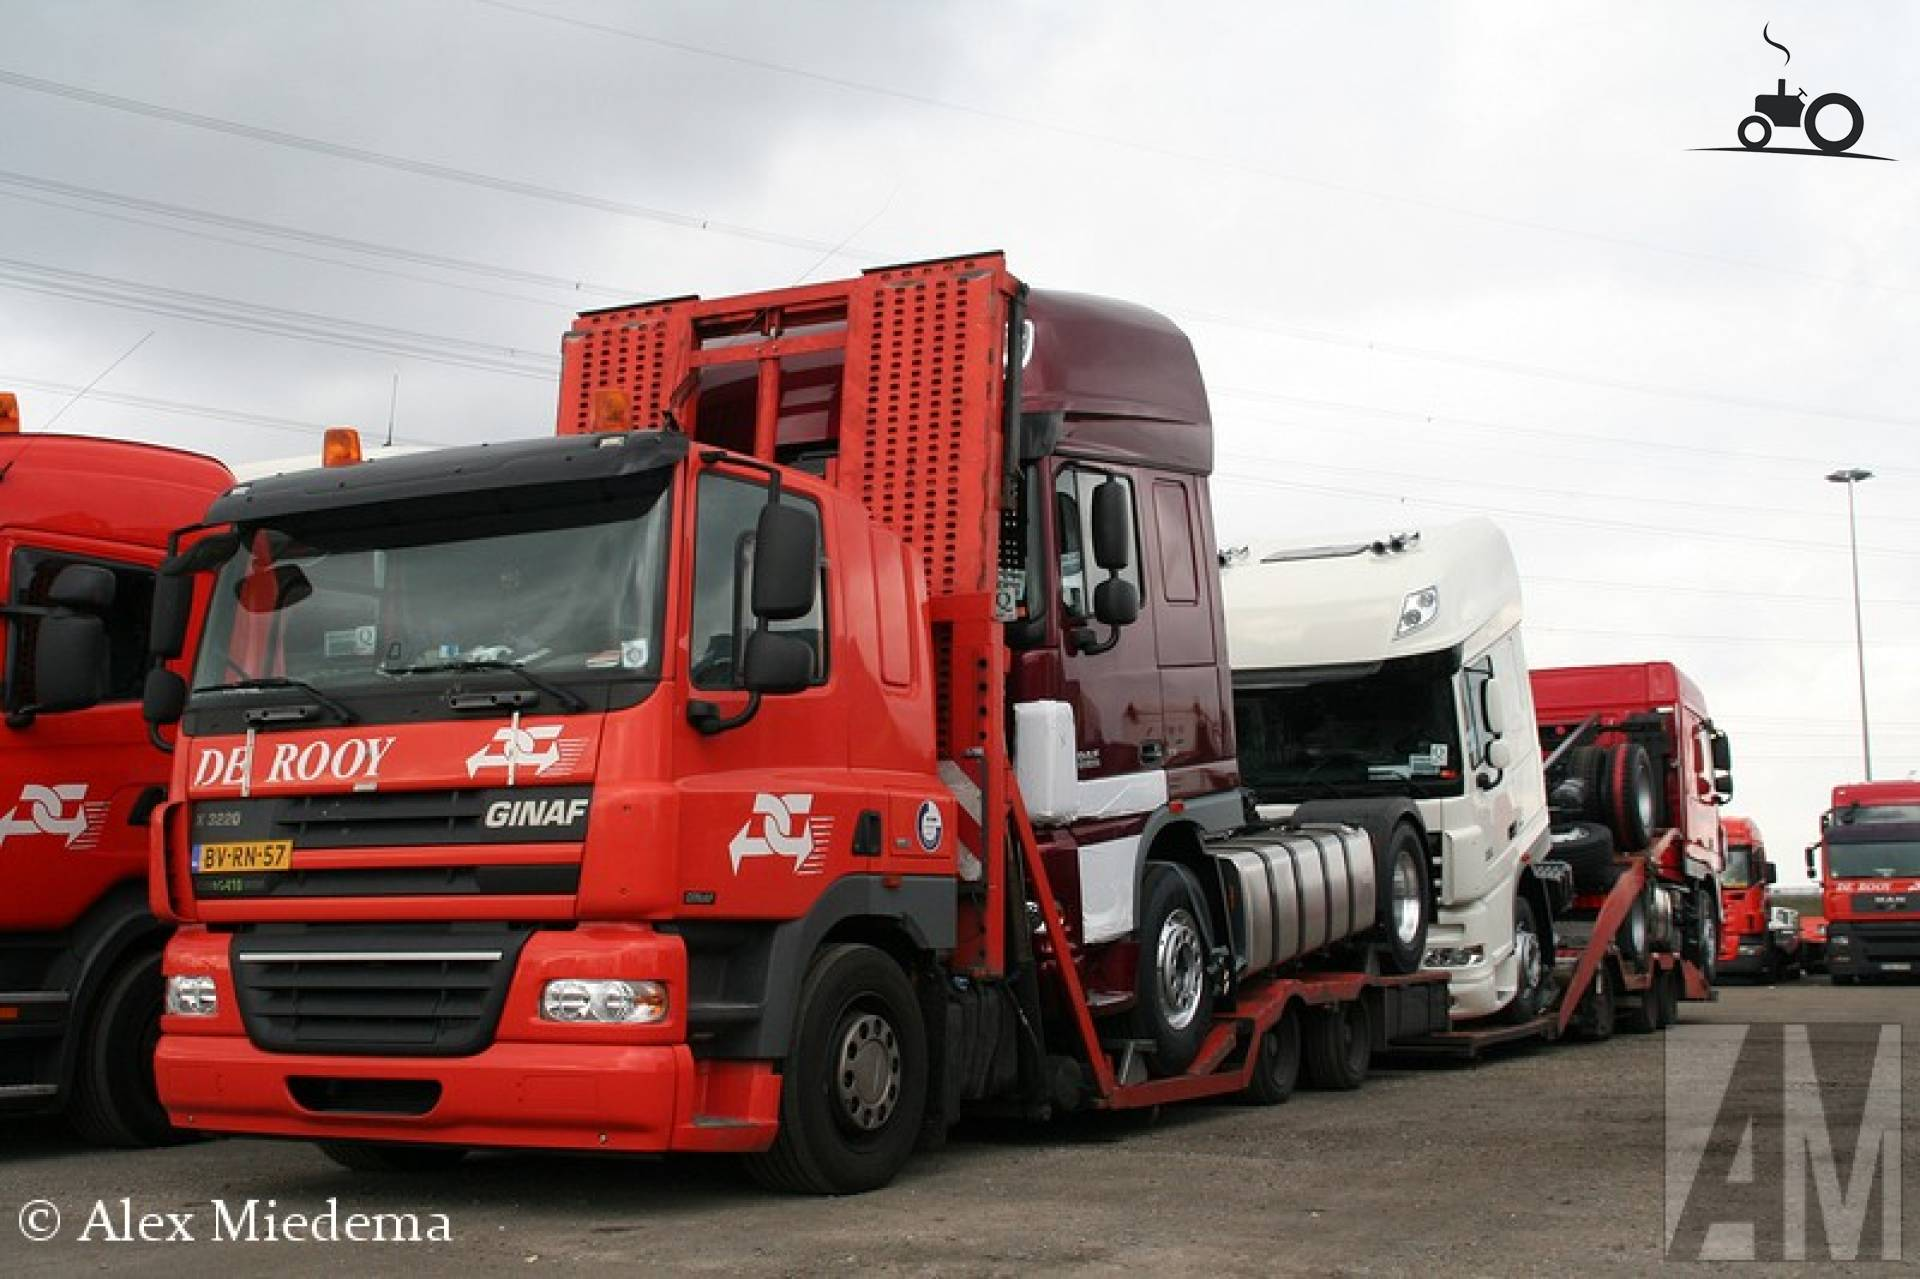 GINAF X3220